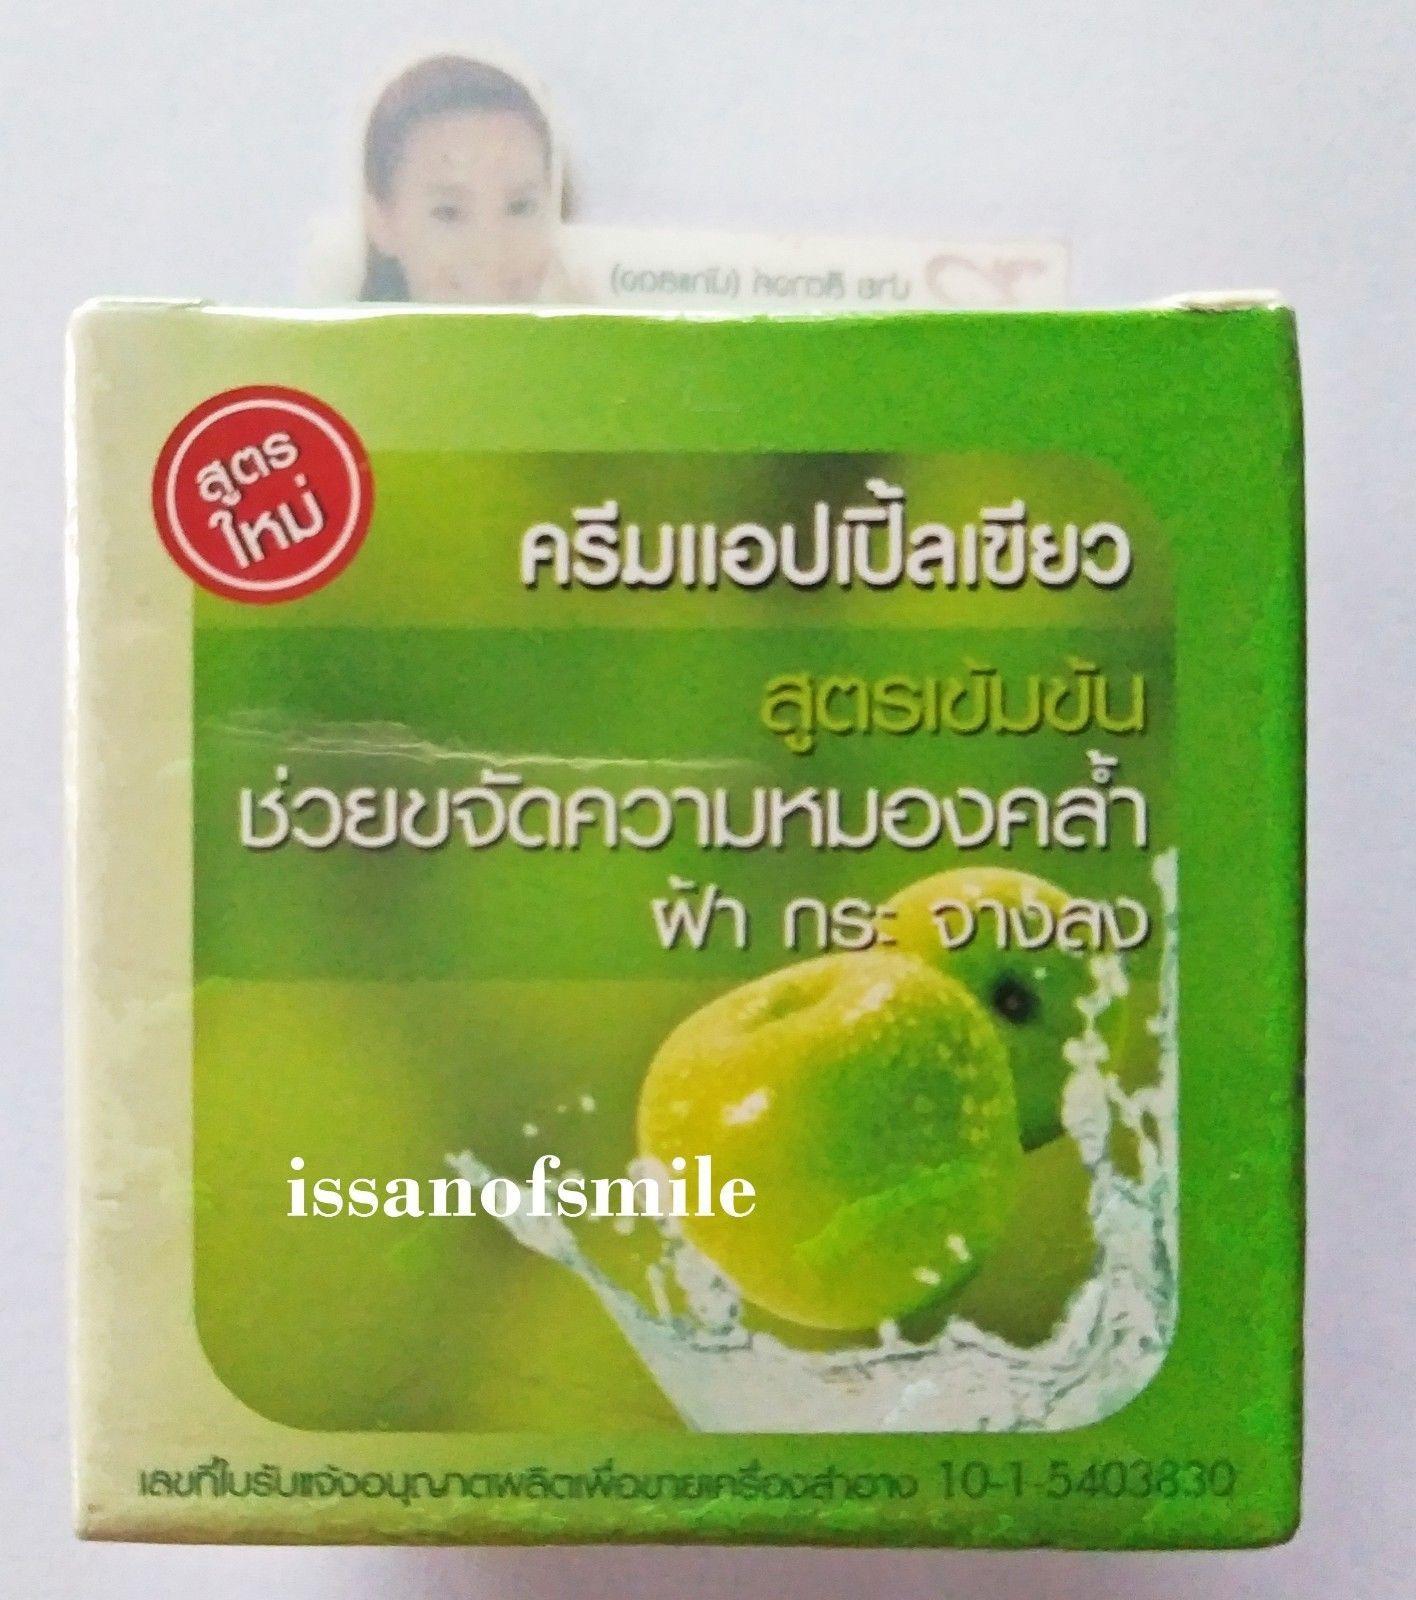 3 x 8g. Dr. P Apple Cream Whitening Treatment AHA Vitamin C Extract